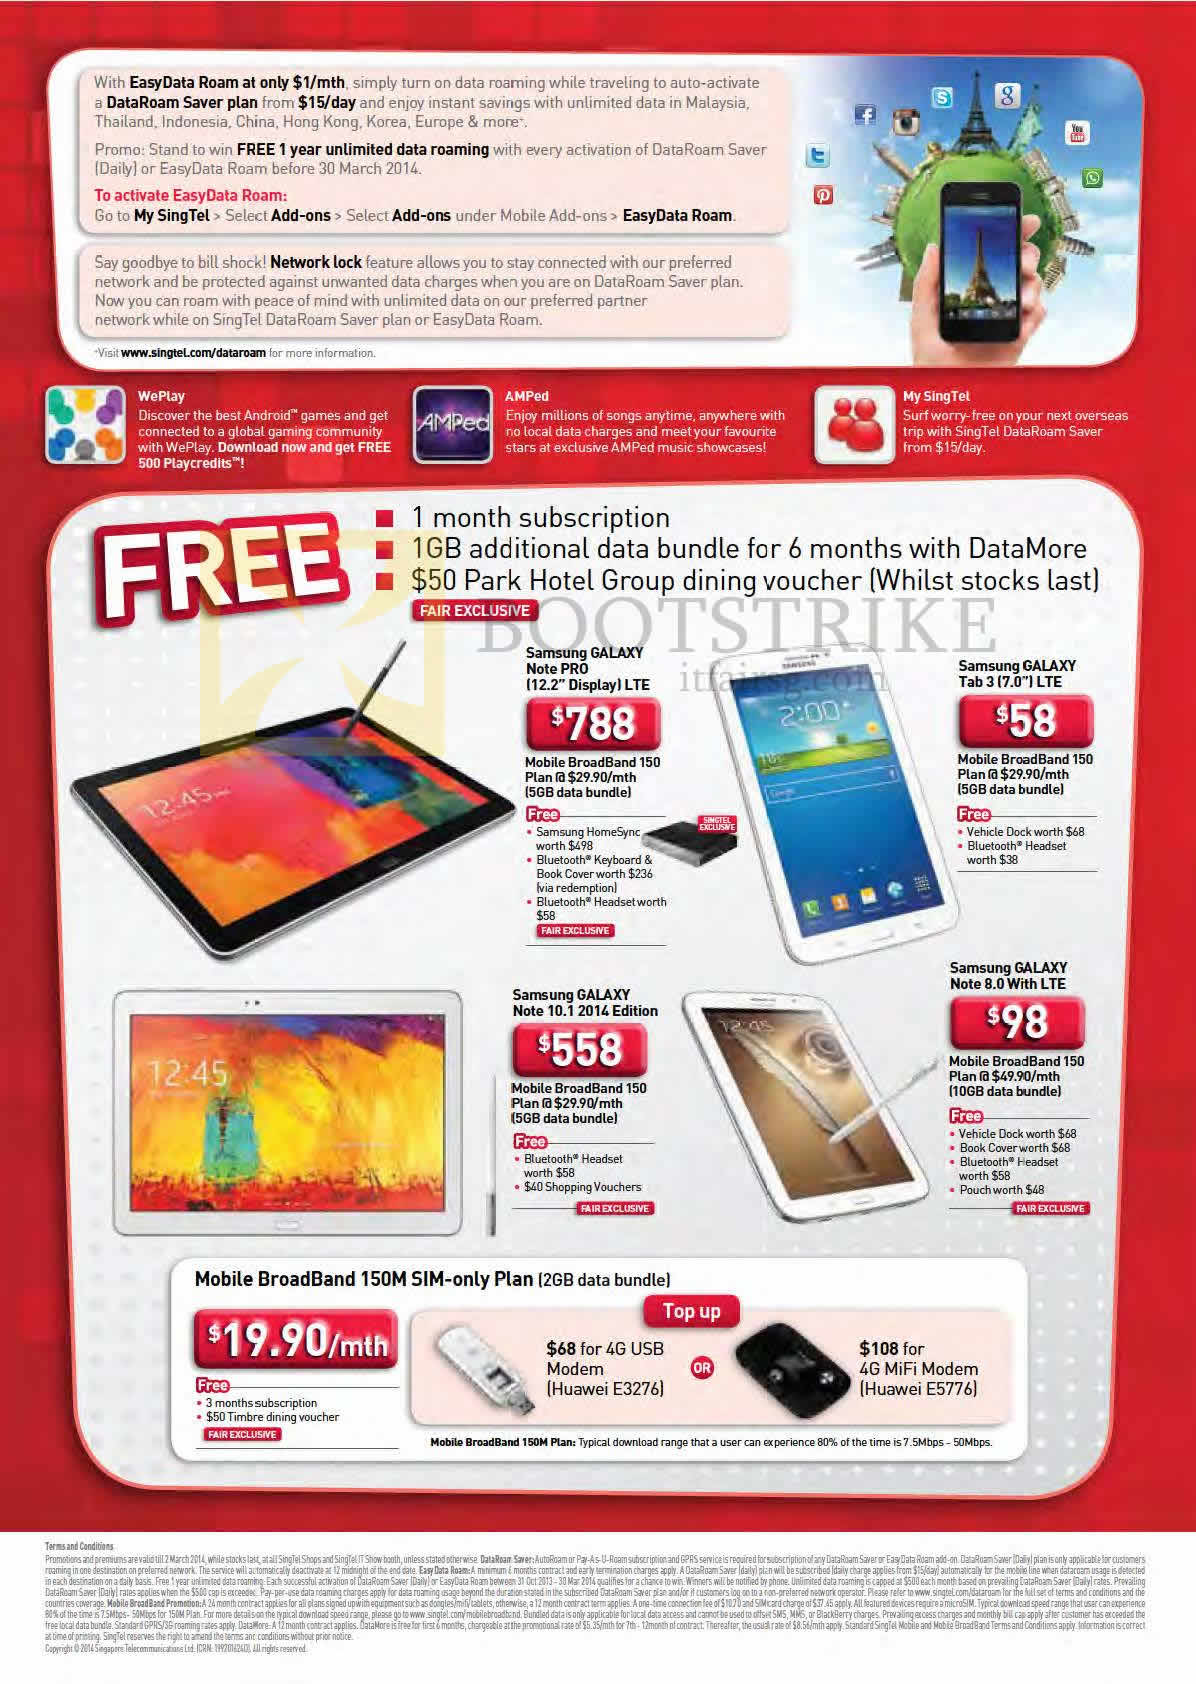 Singtel Mobile Broadband Samsung Galaxy Note Pro Tab 3 70 Voucher 1gb It Show 2014 Price List Image Brochure Of